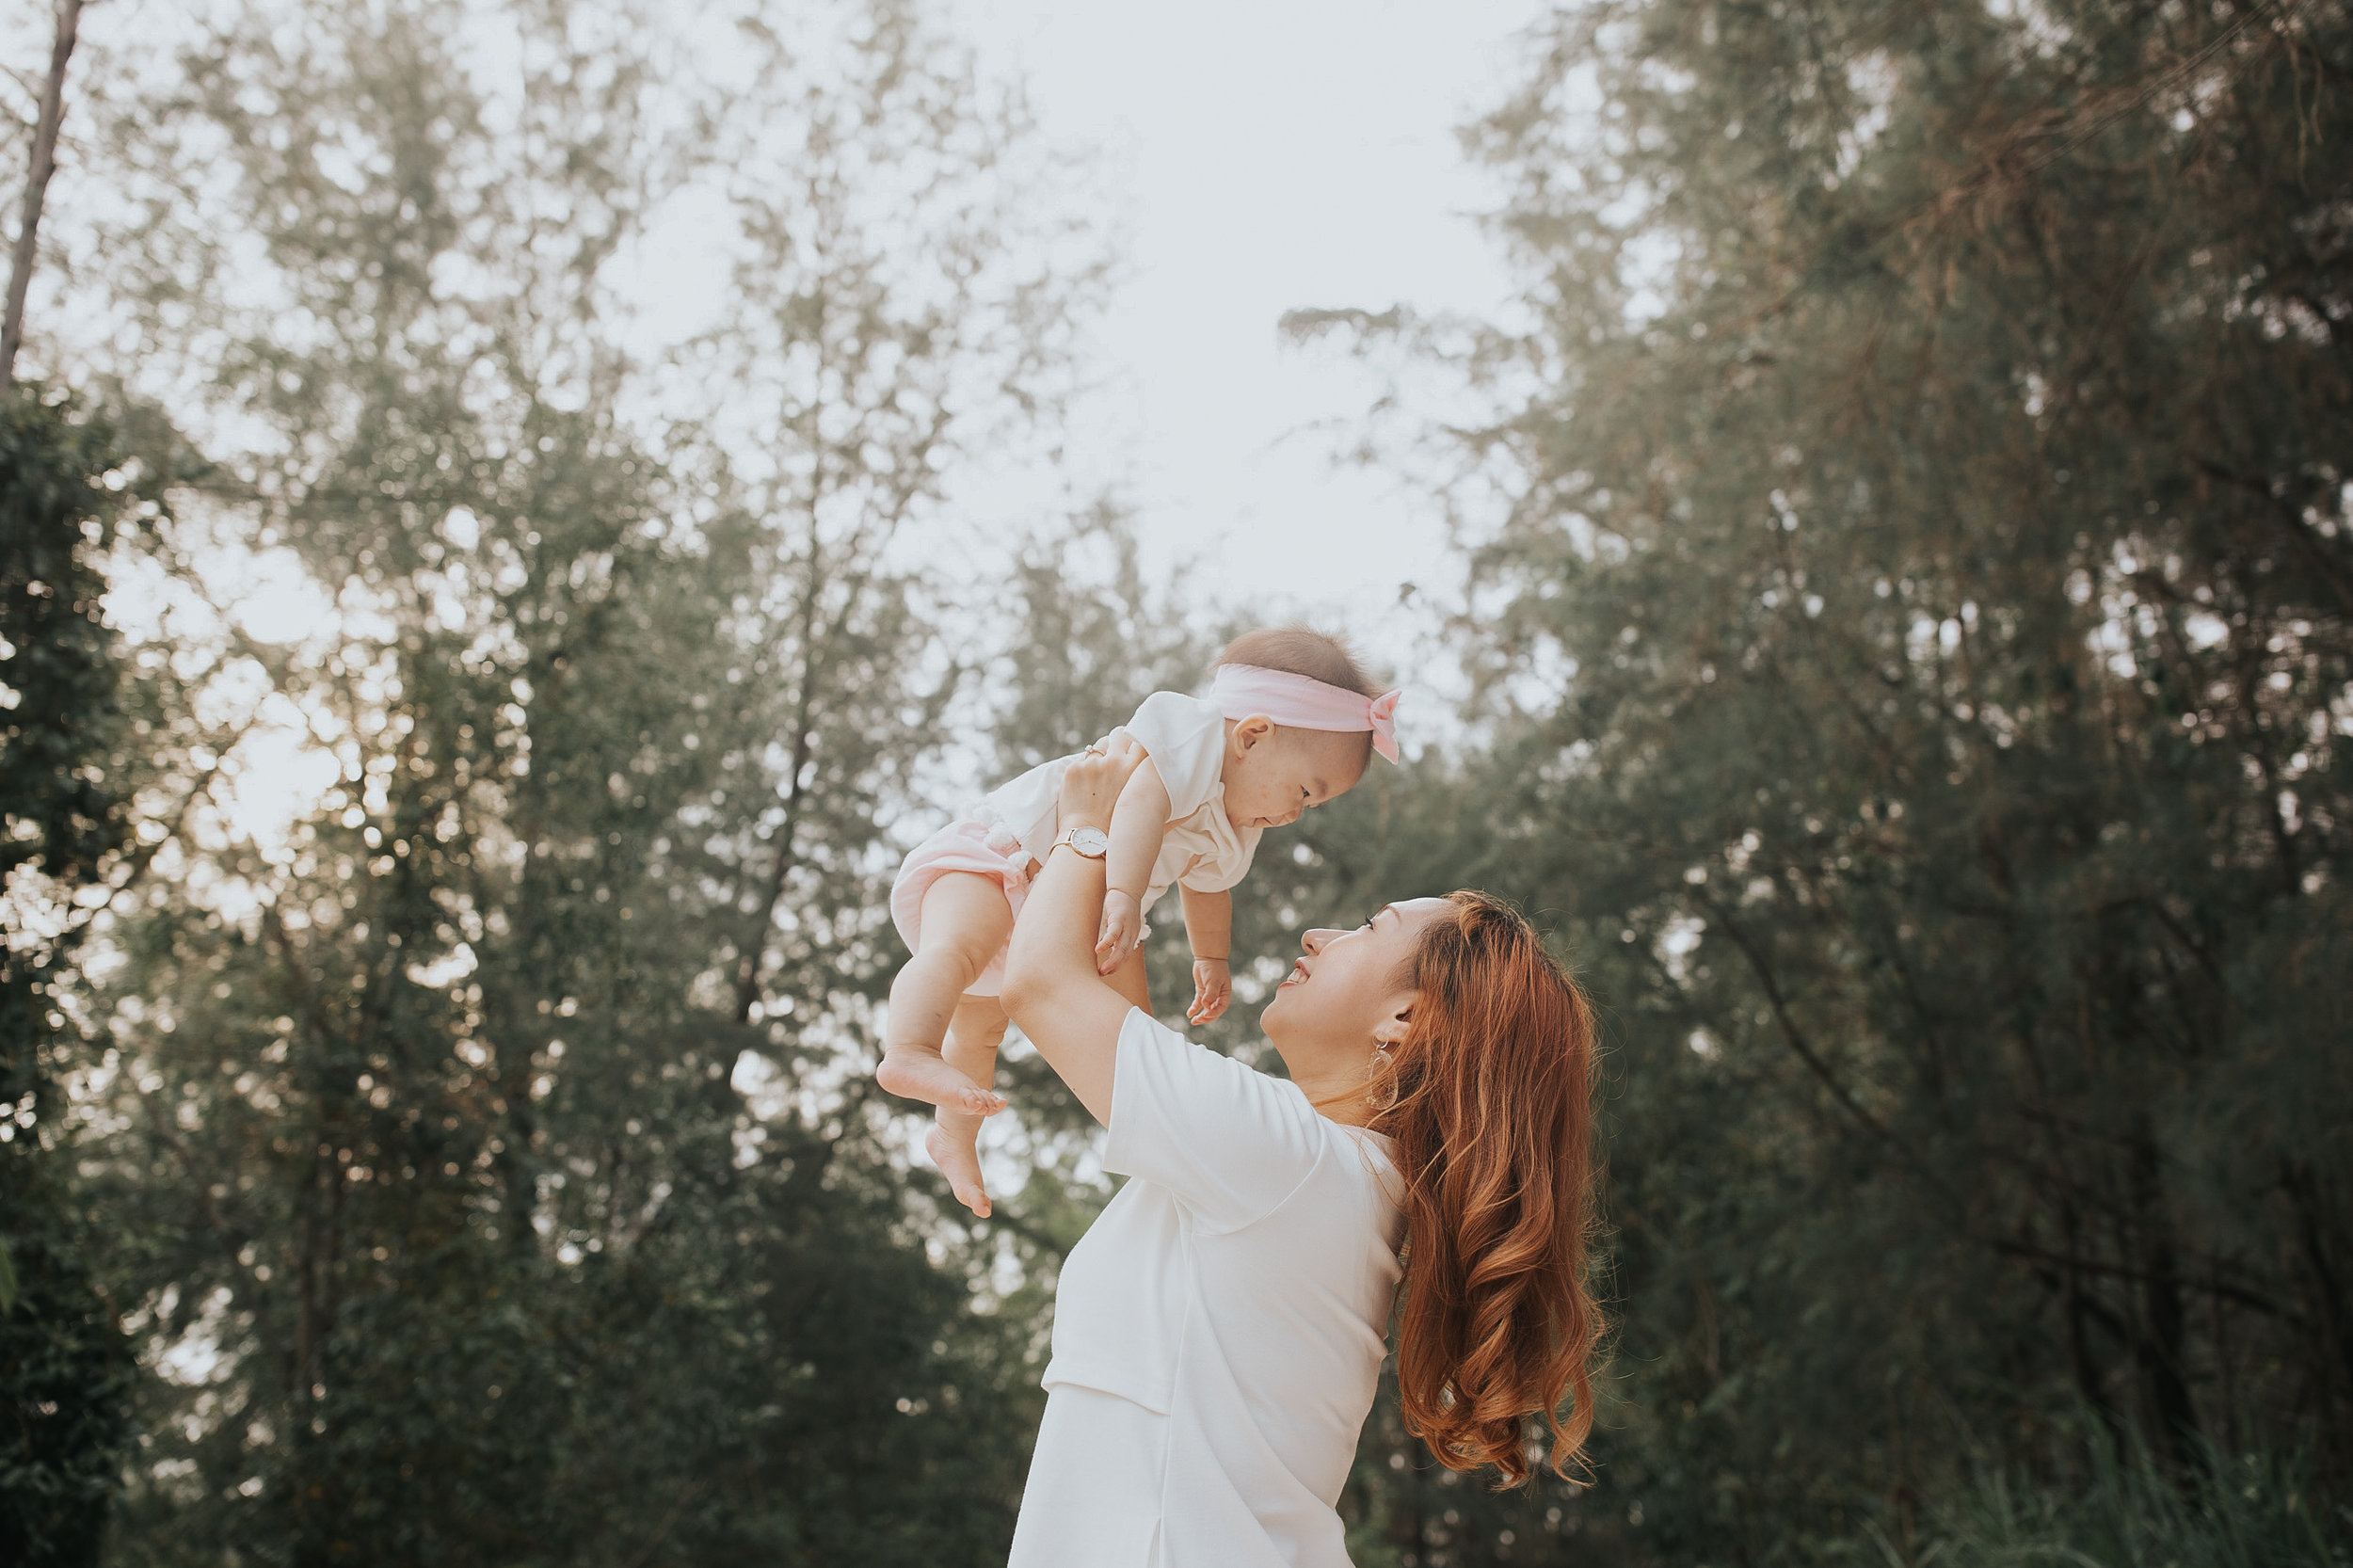 Nadskai Family 2019 (11).jpg